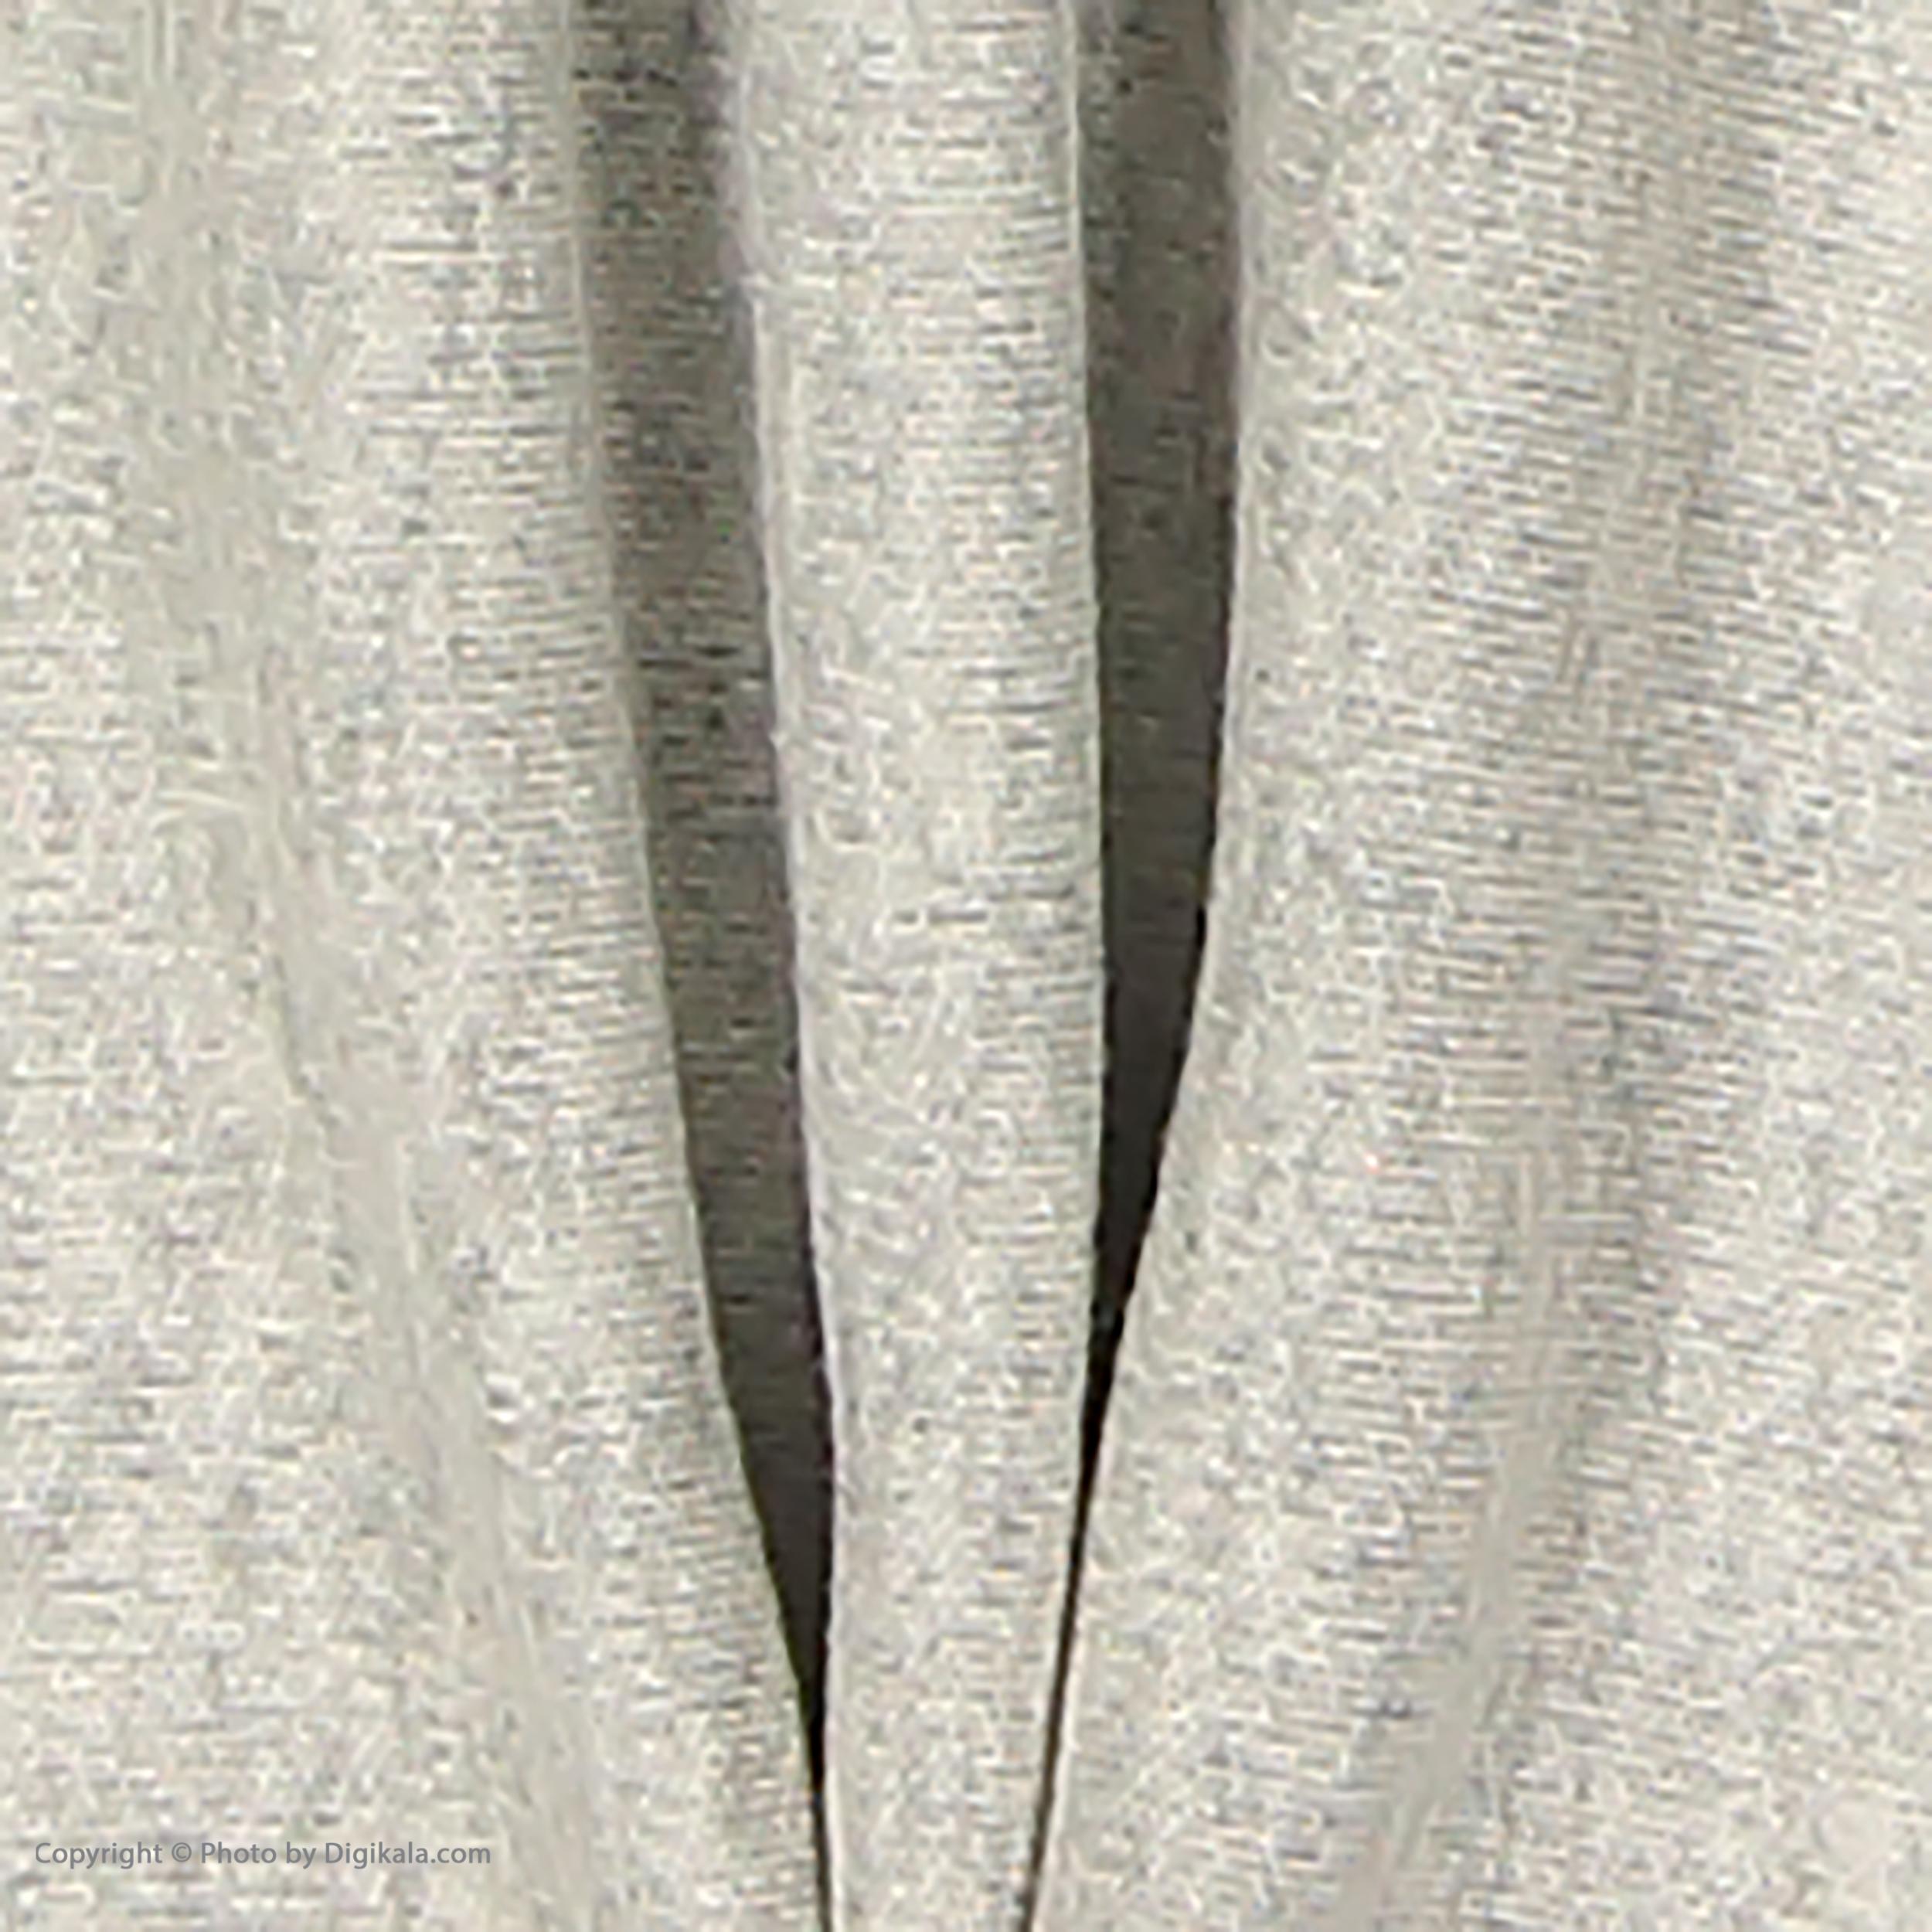 شلوار راحتی پسرانه سون پون مدل 1391373-90 -  - 5